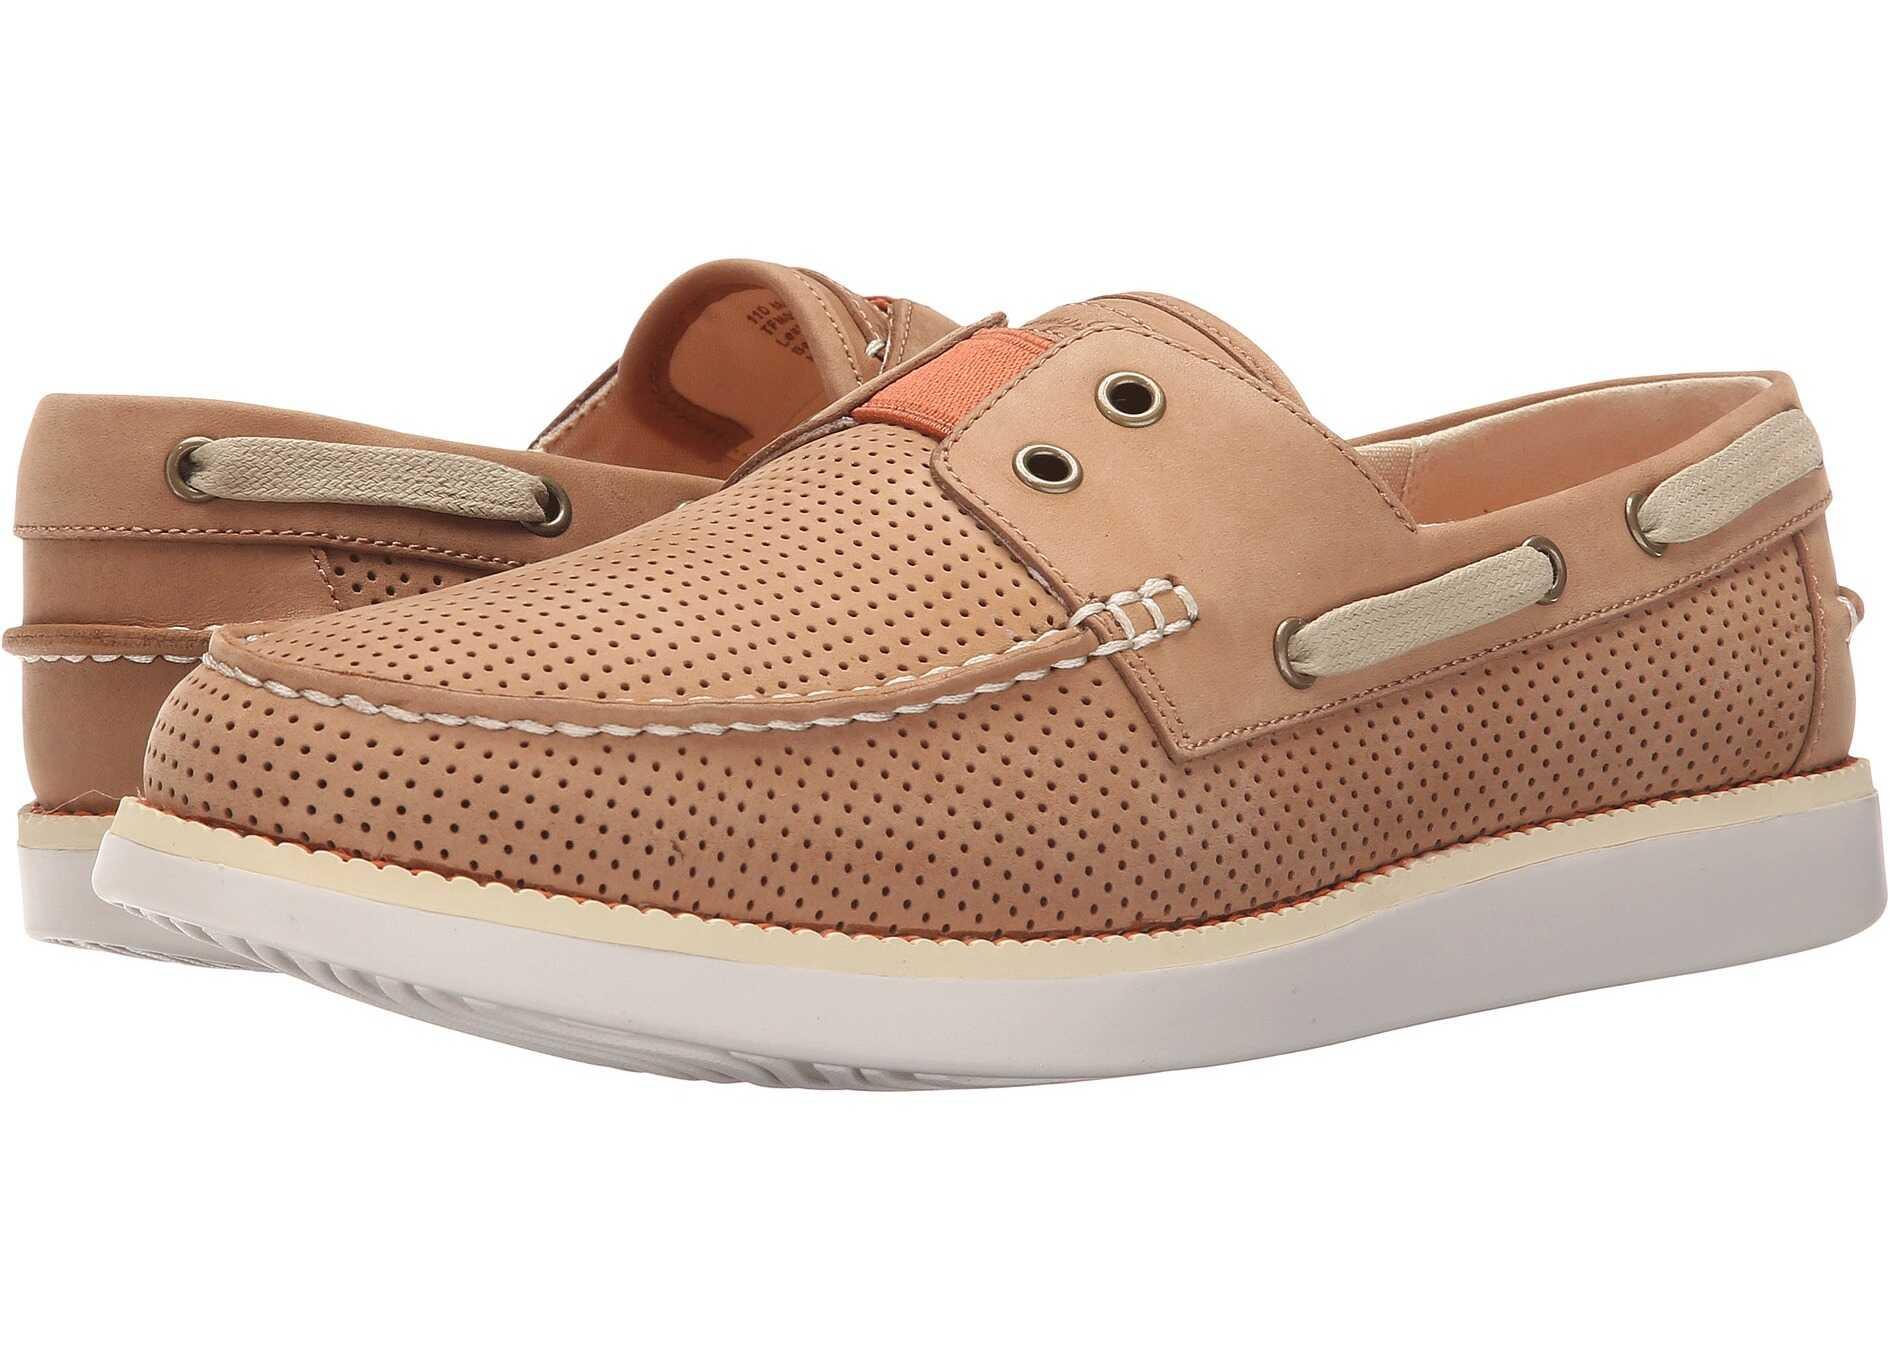 Pantofi Casual Barbati Tommy Bahama Relaxology Mah